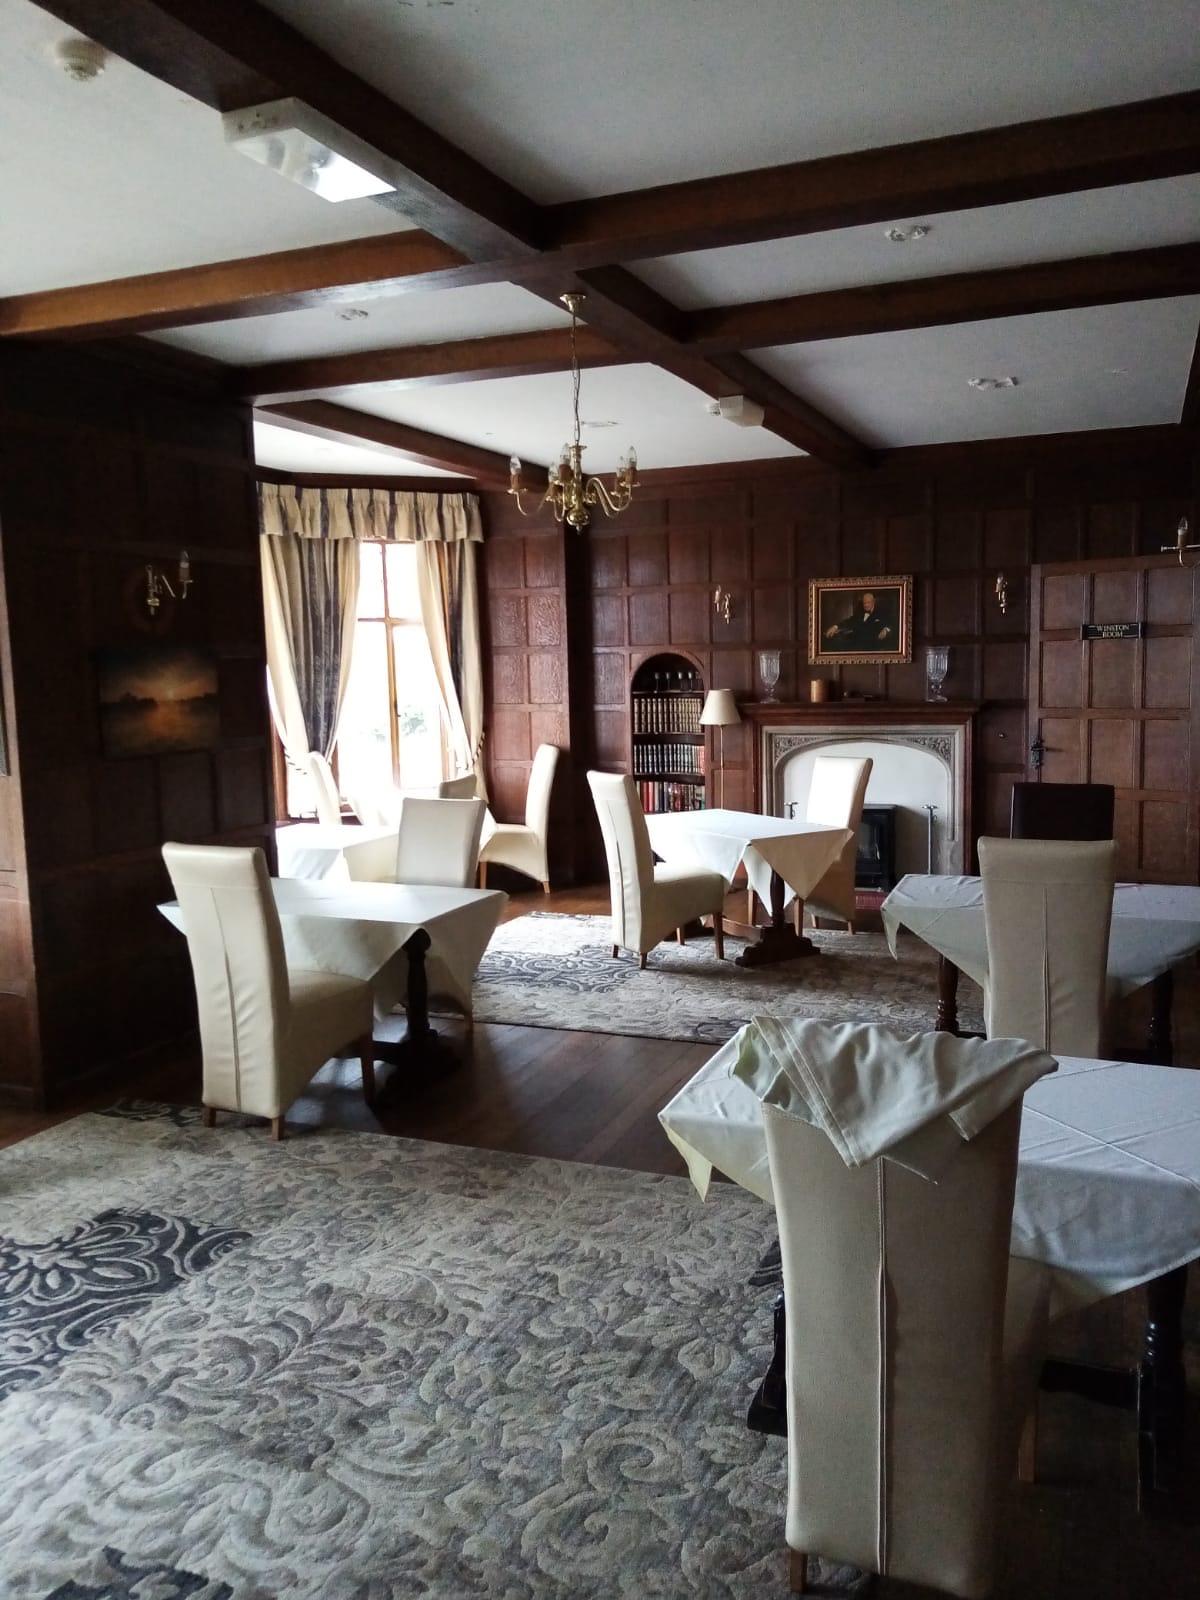 Winston room